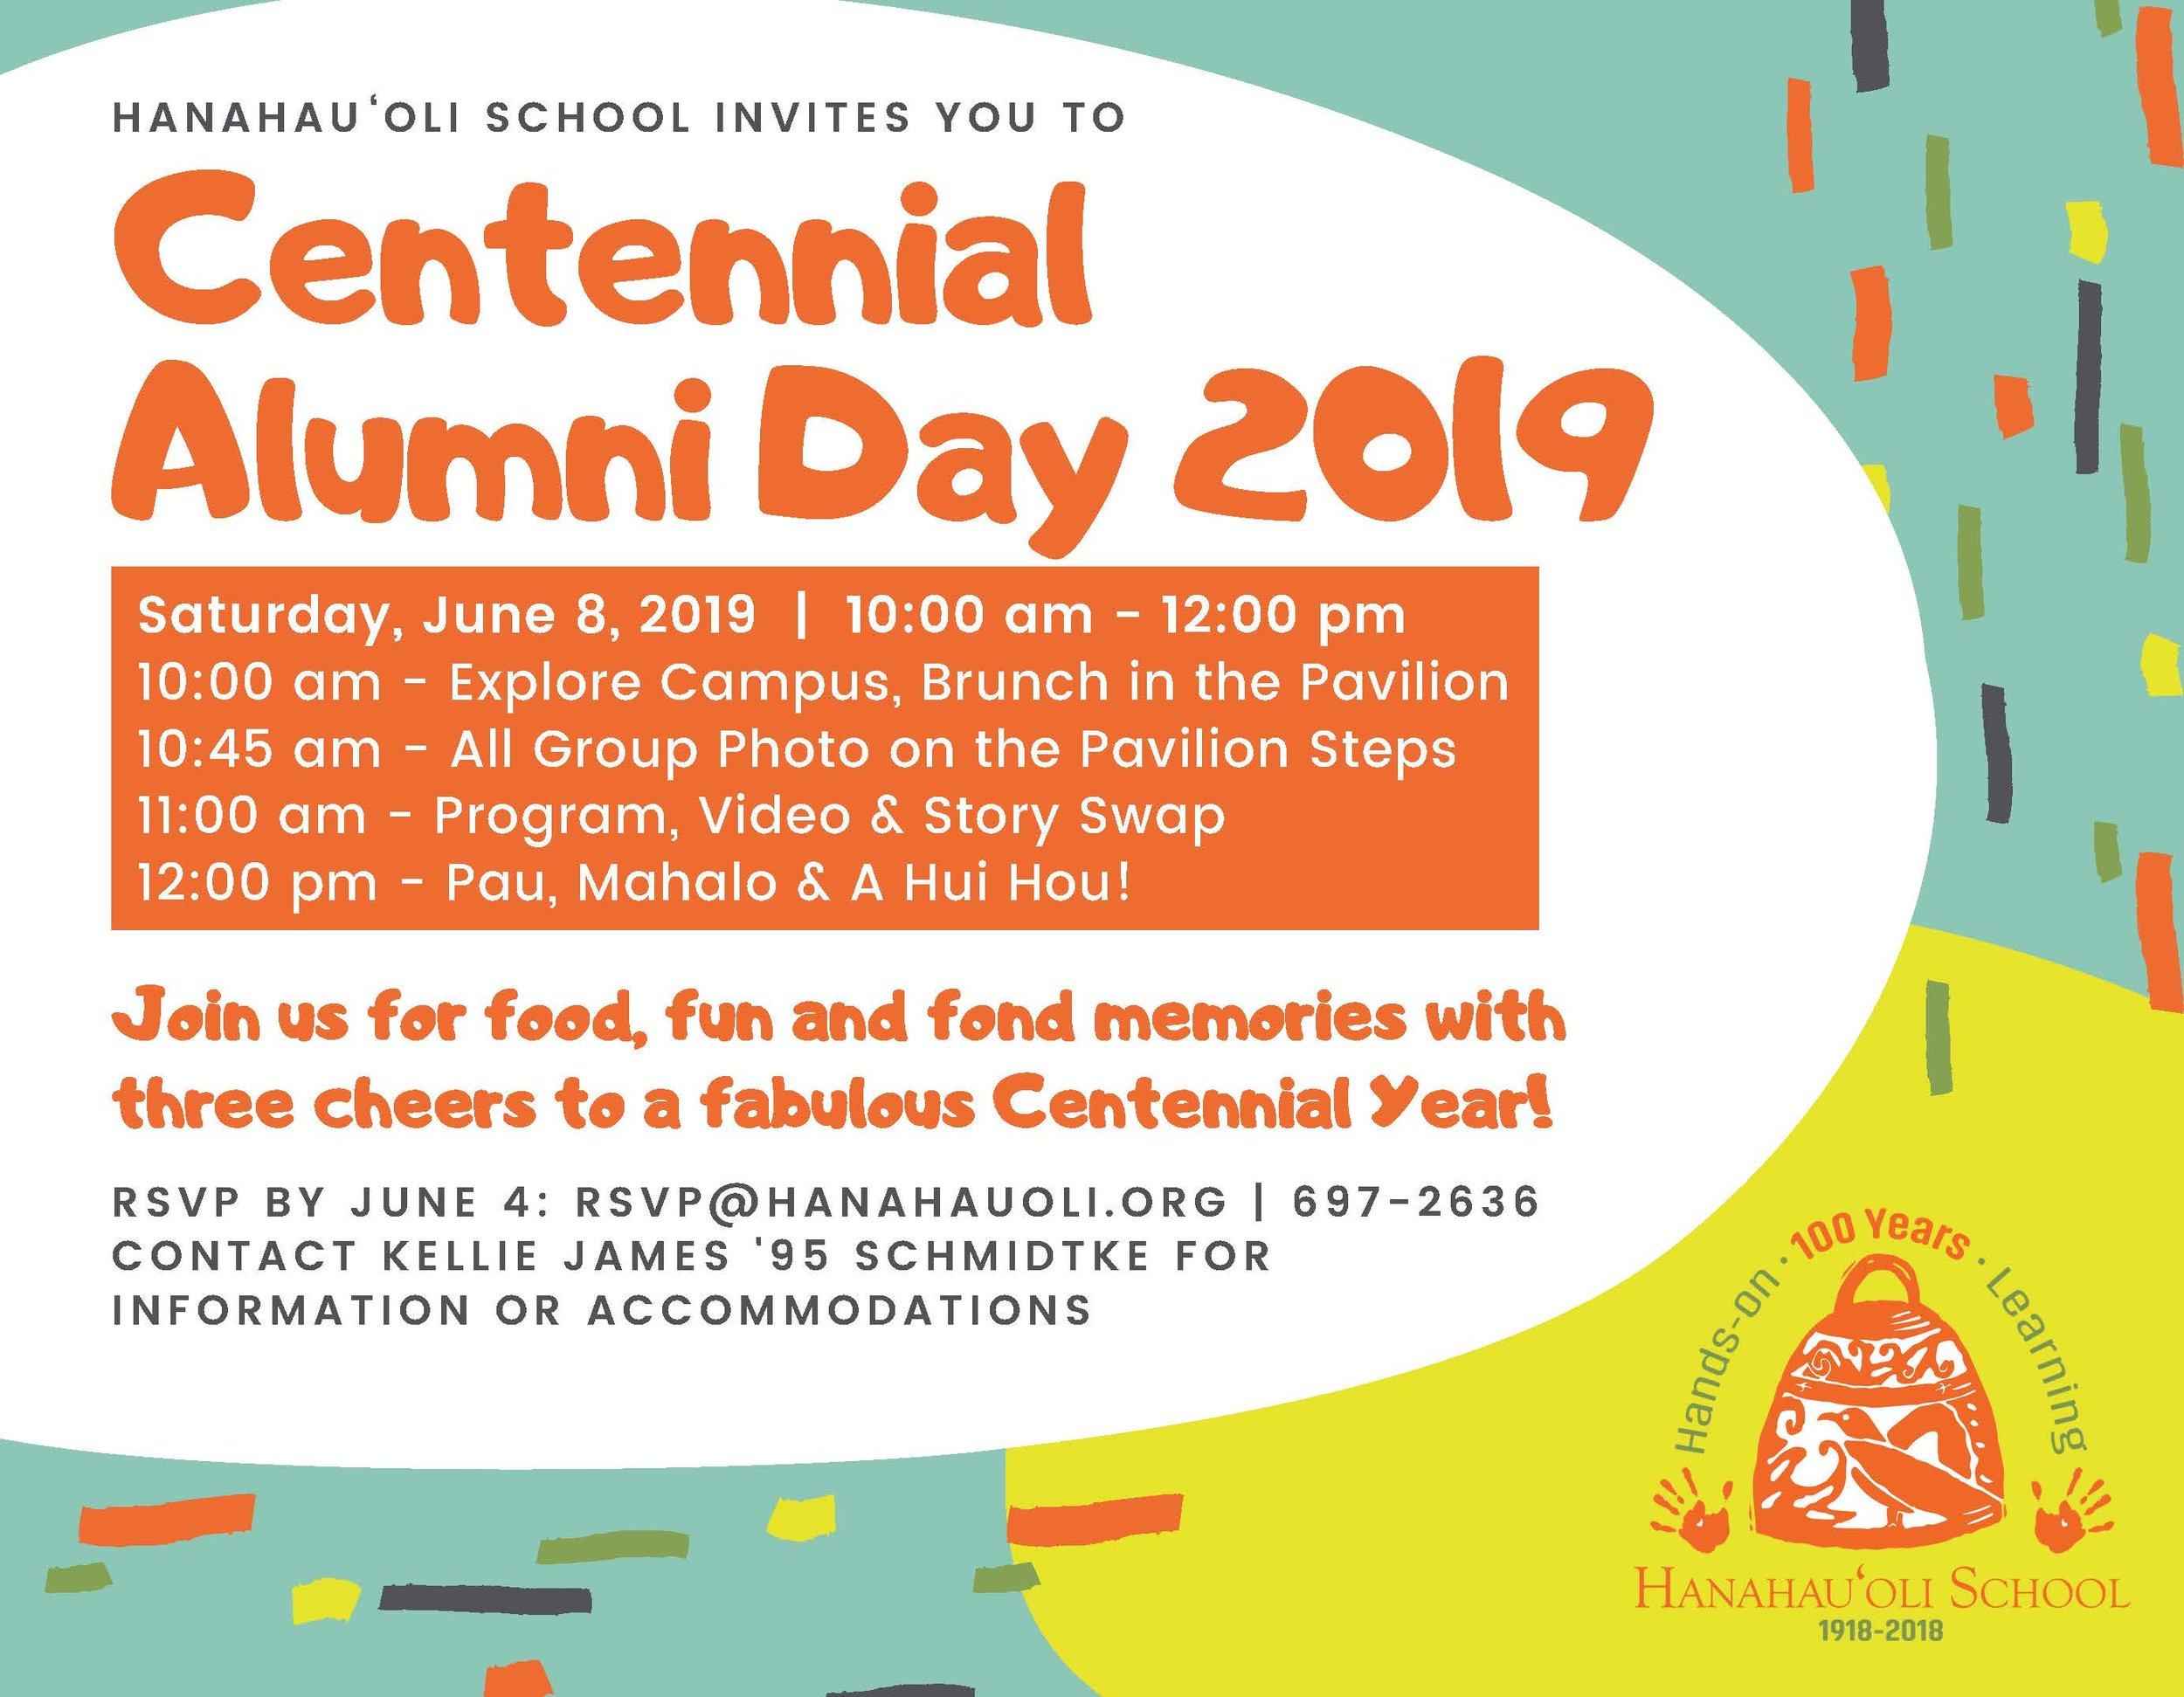 Hanahau'oli school Alumni Day 2019 (3) 1.jpg